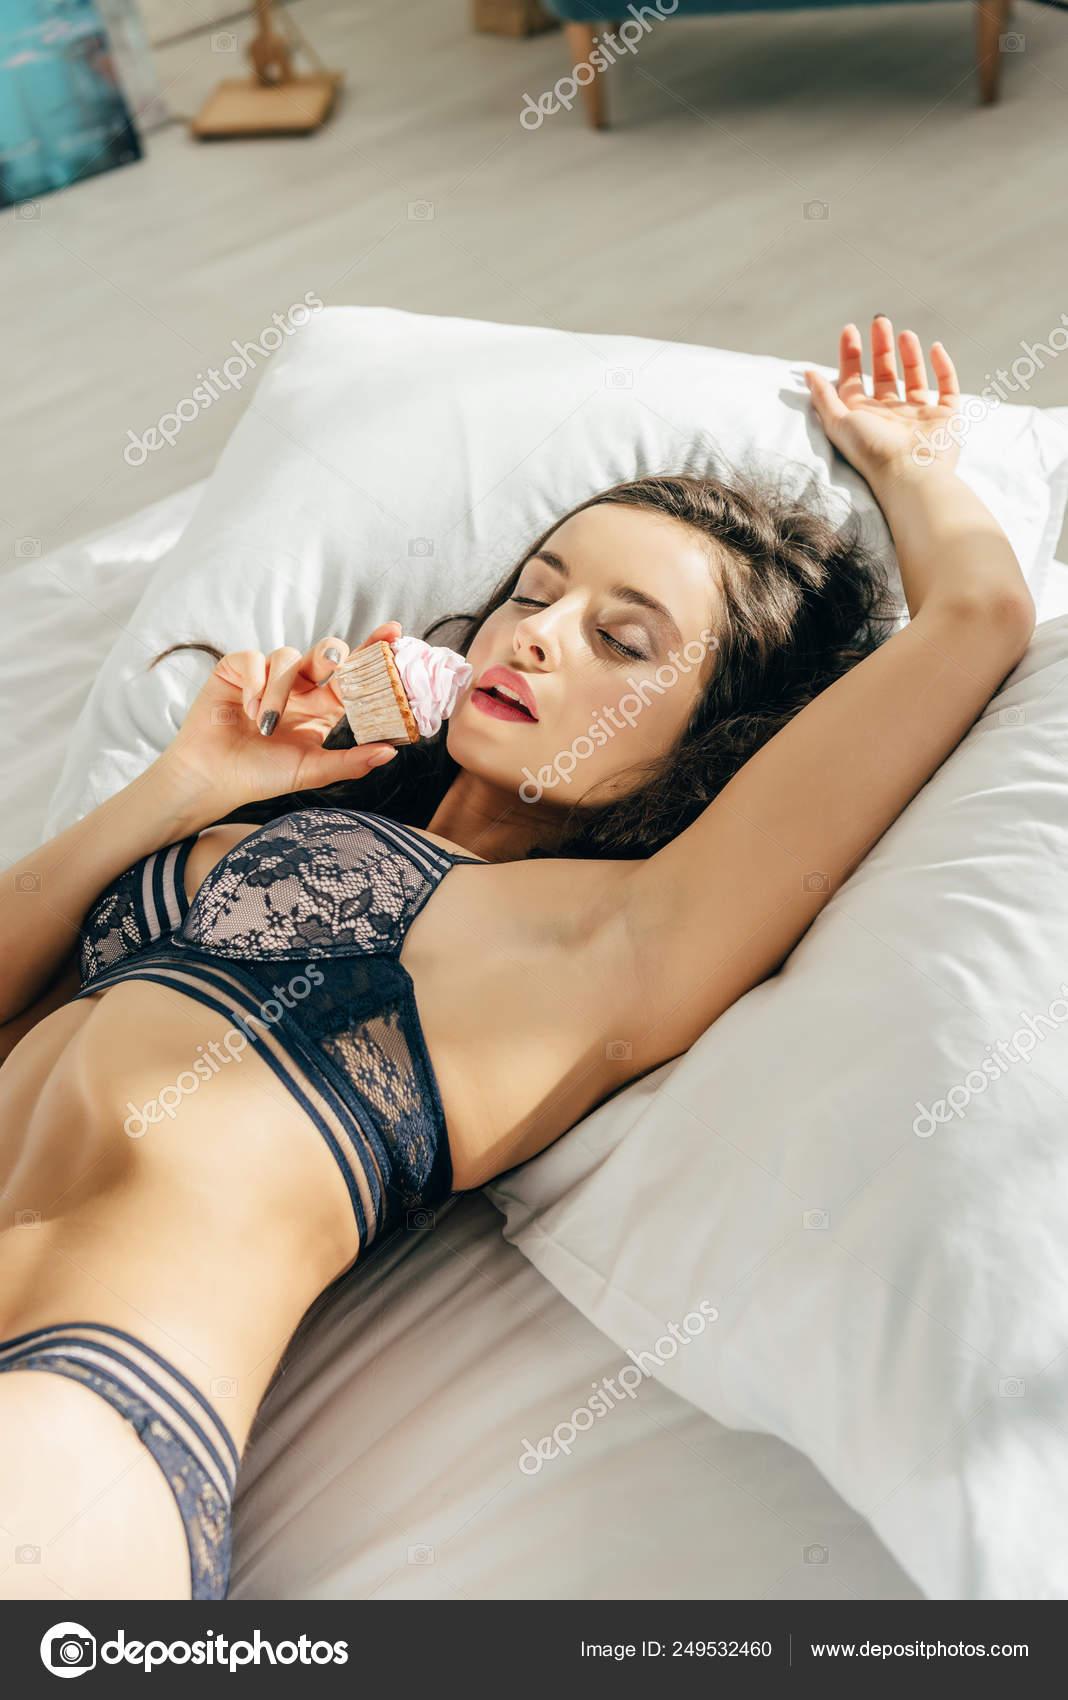 Tasty Panties Pics Gif